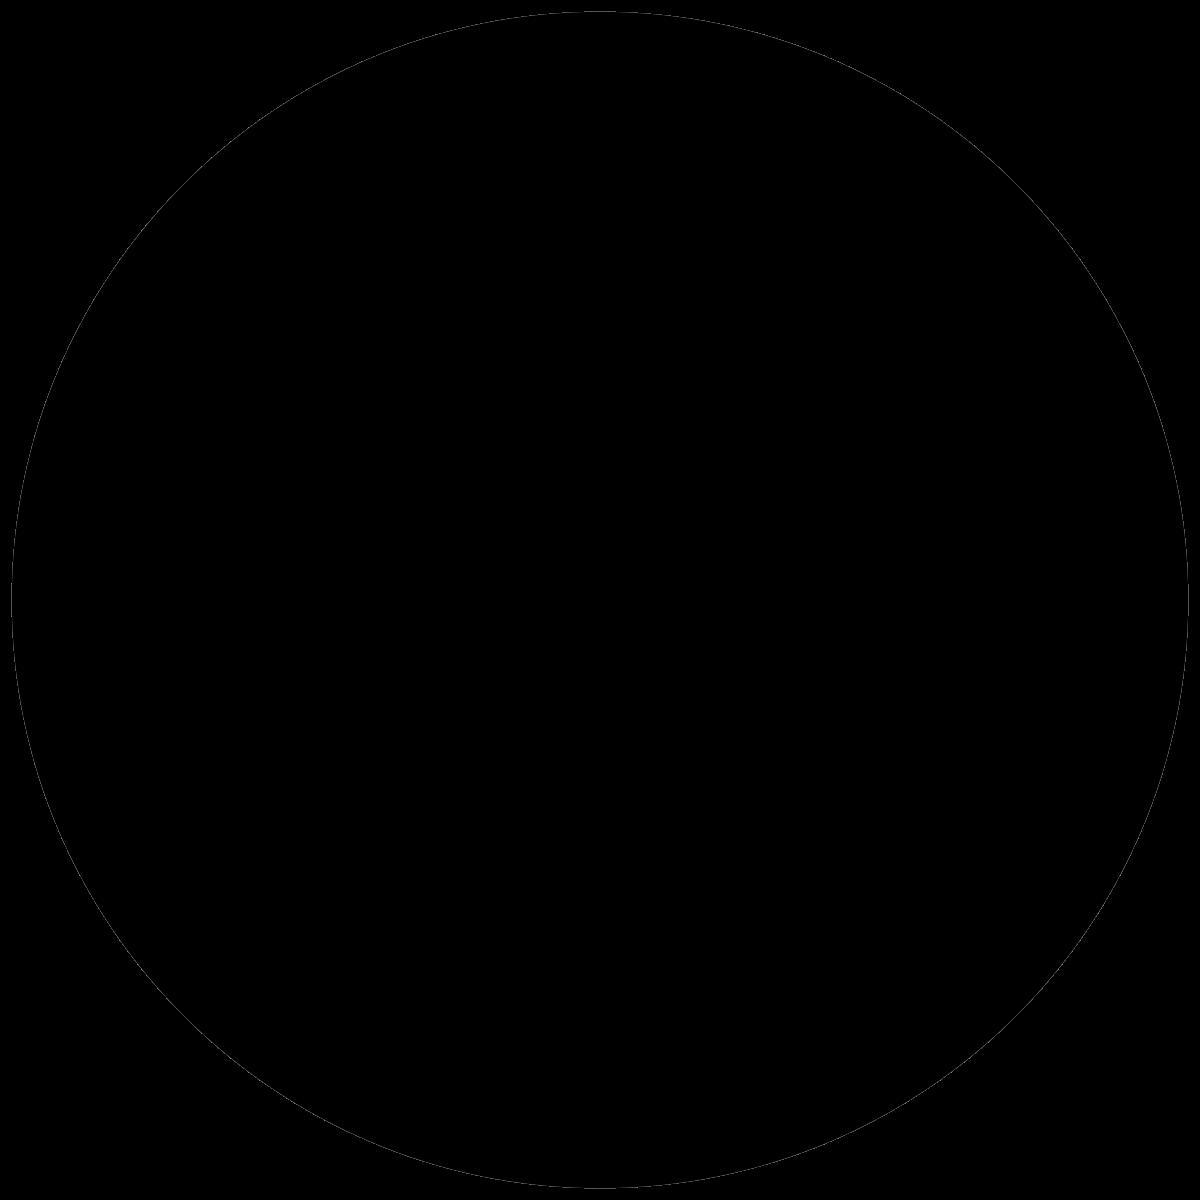 1200x1200 Circle Packing In A Circle